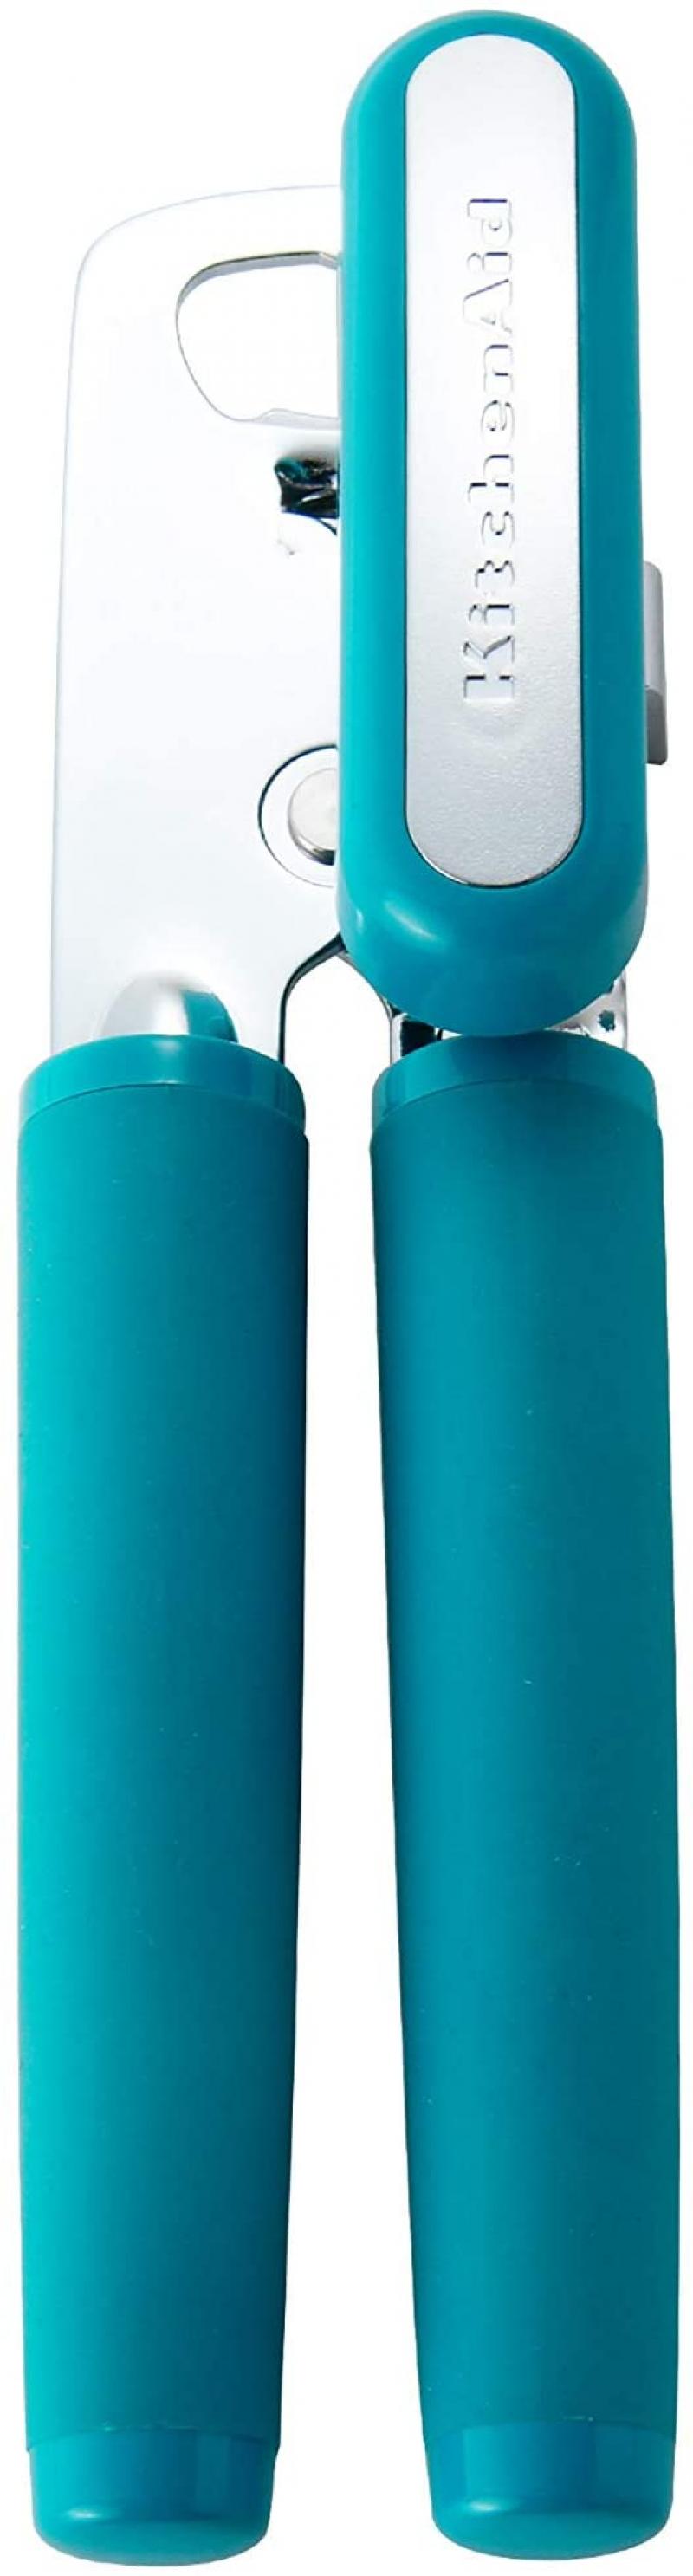 ihocon: KitchenAid Soft Classic Multifunction Can Opener / Bottle Opener, 8.29-Inch, Ocean Drive    多功能開罐/開瓶器